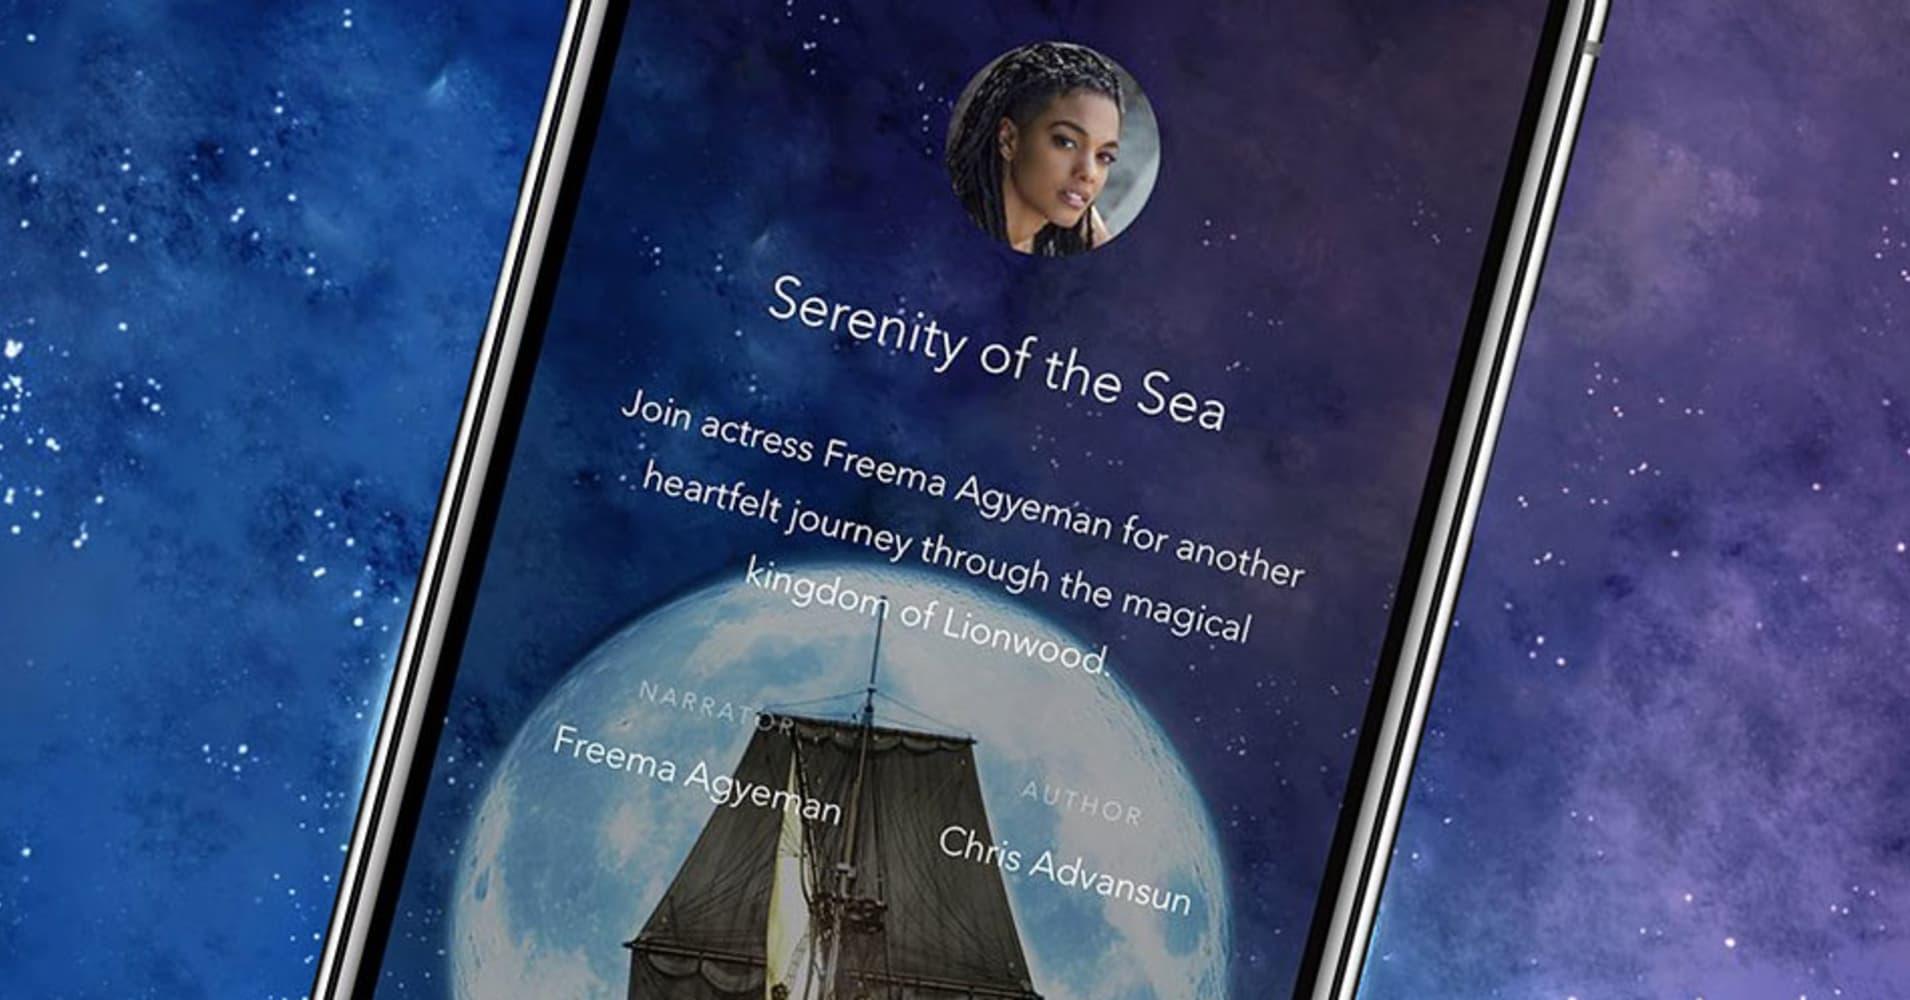 Relaxation app Calm raises $88 million, valuing it $1 billion